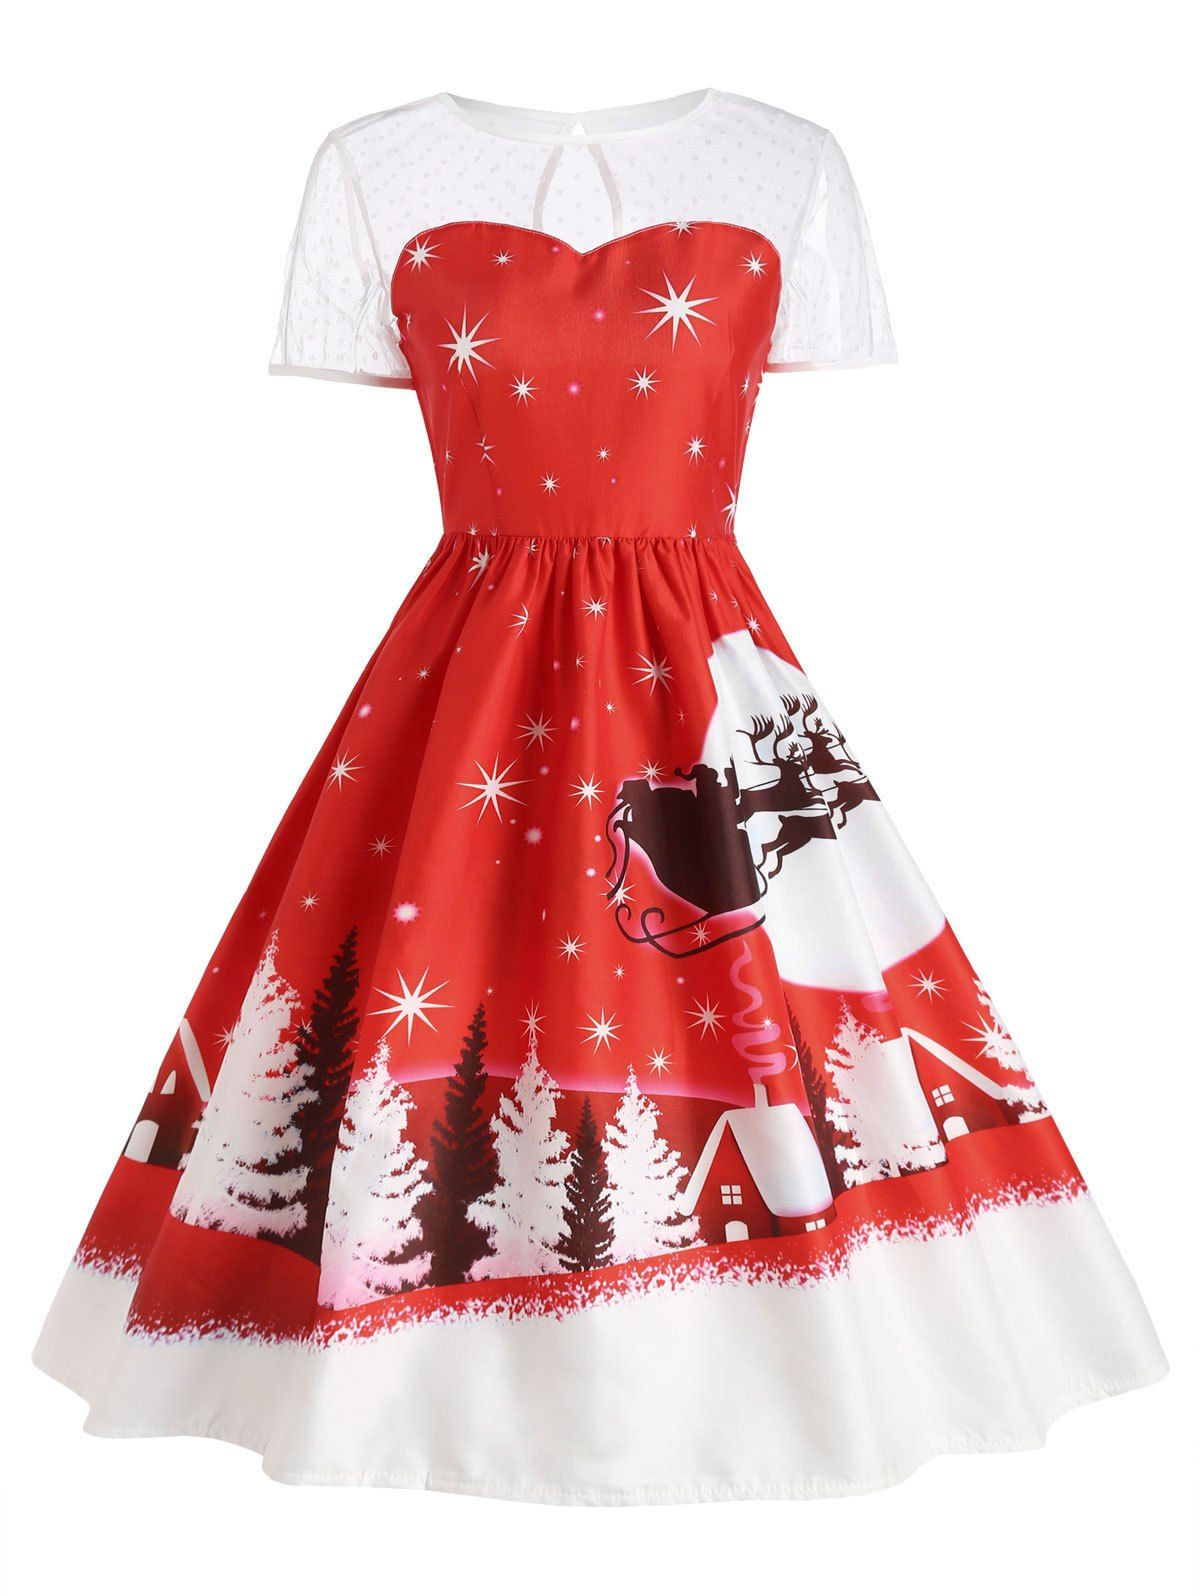 634b45098c Wholesale Santa Claus Deer Christmas Vintage Dress M Red Online. Cheap  Vintage Dress And Floral Vintage Dress on Rosewholesale.com